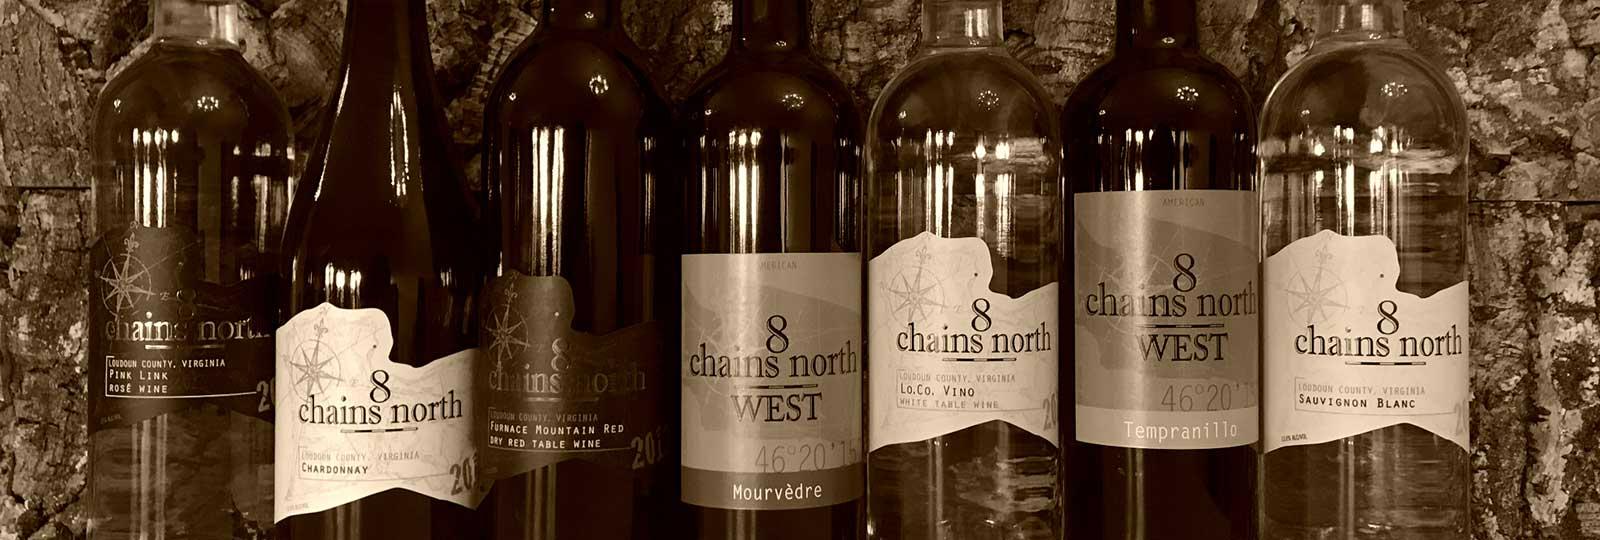 loudoun-wine-bottles1600.jpg